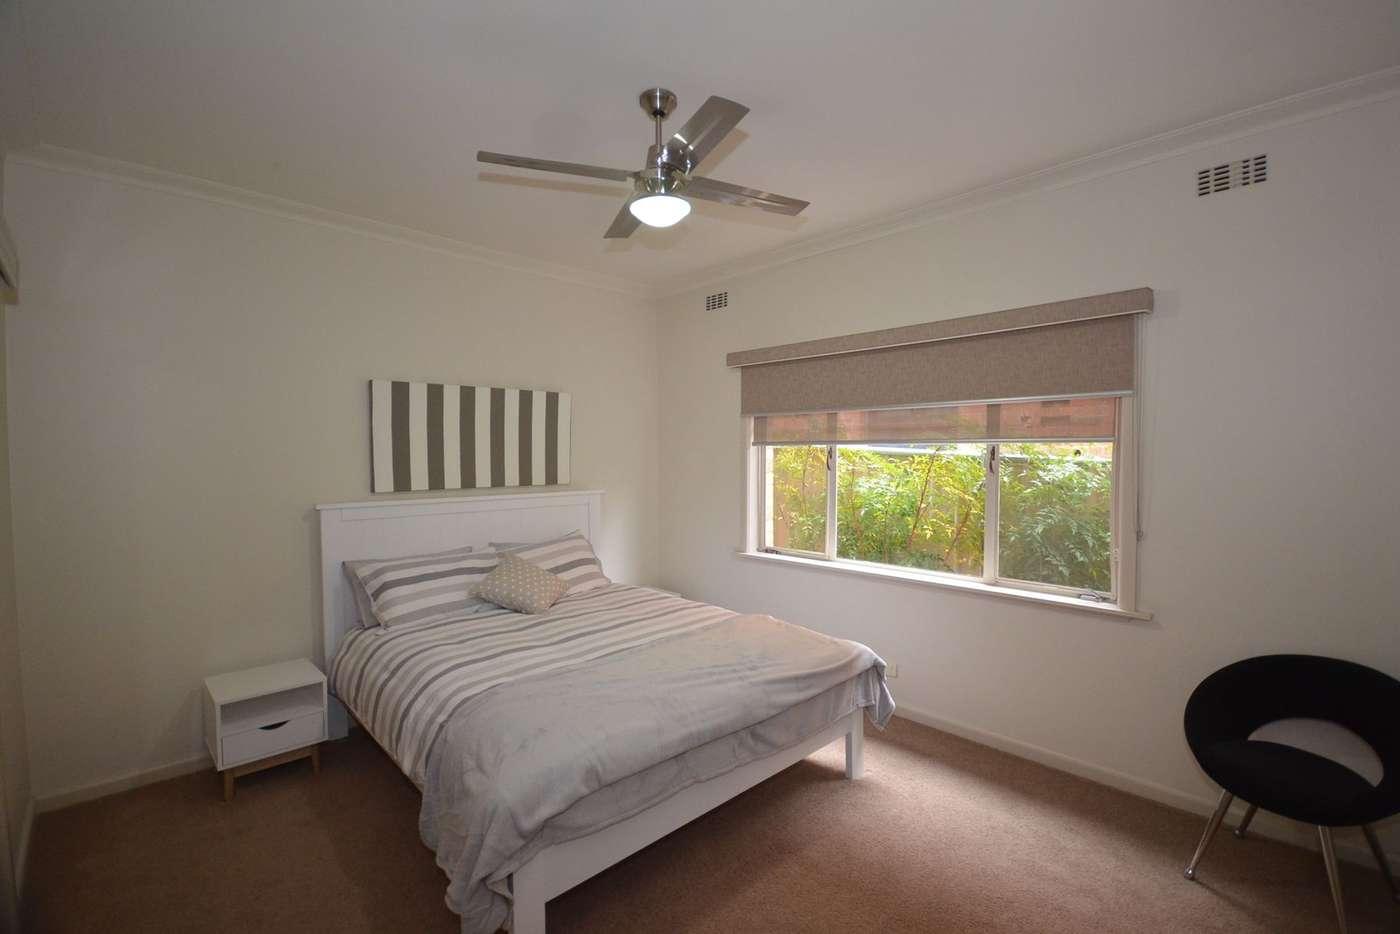 Sixth view of Homely house listing, 8 Waterloo Street, Bendigo VIC 3550